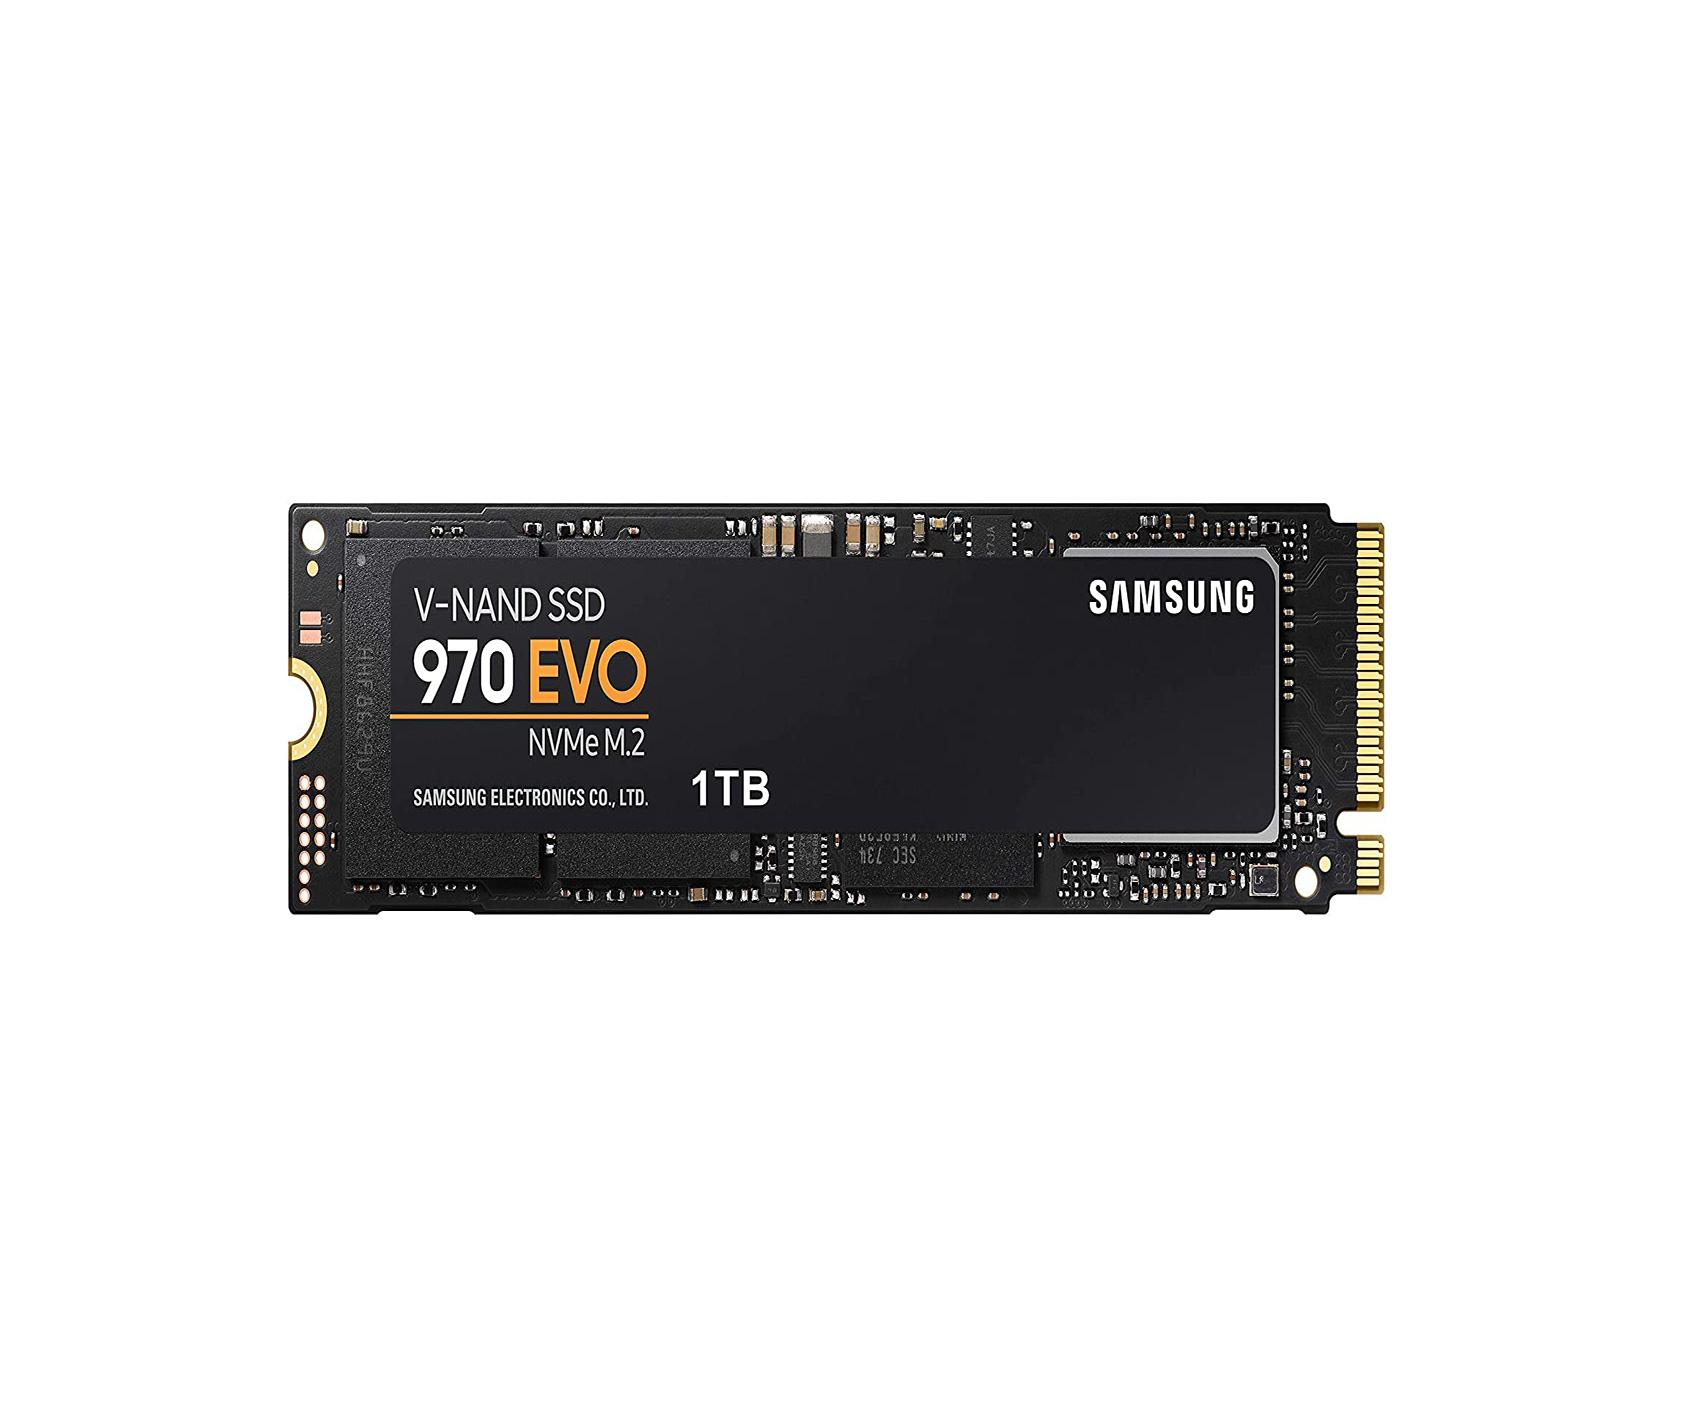 Samsung 970 EVO SSD 1TB - M.2 NVMe